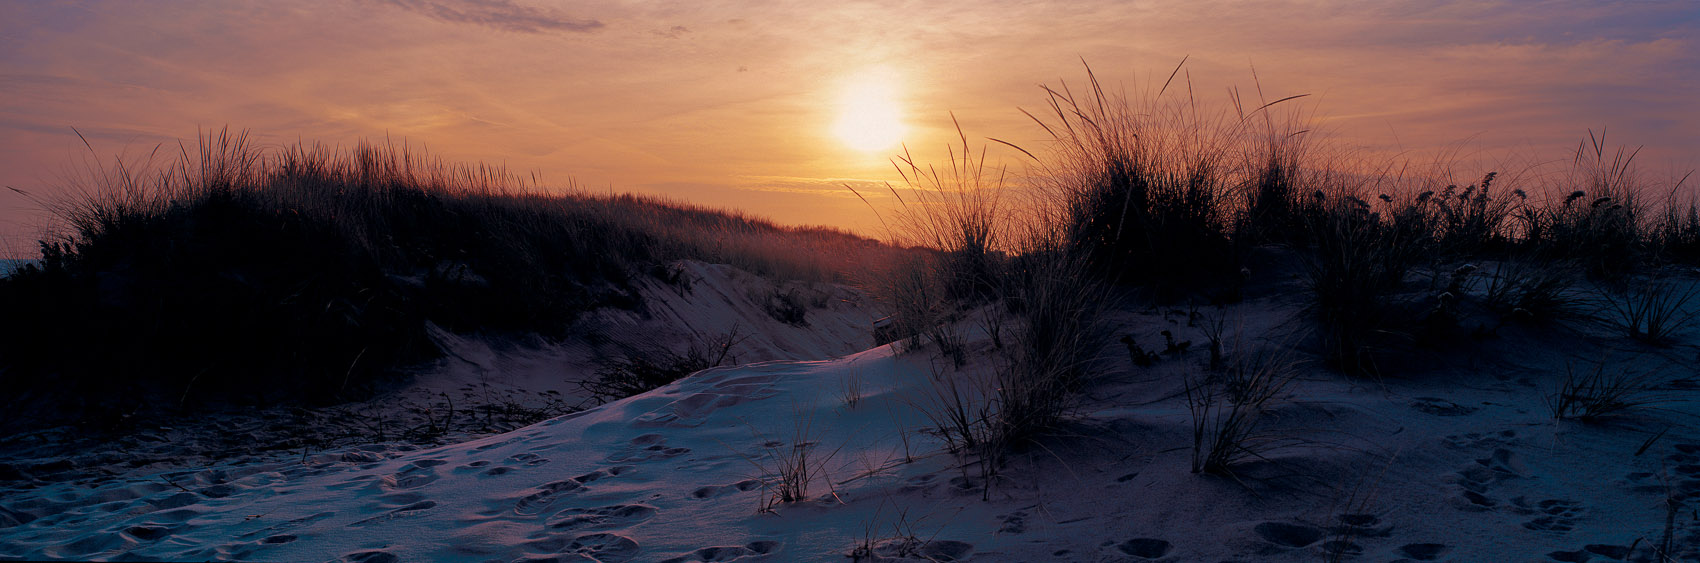 AtlanticDunes_Sunset